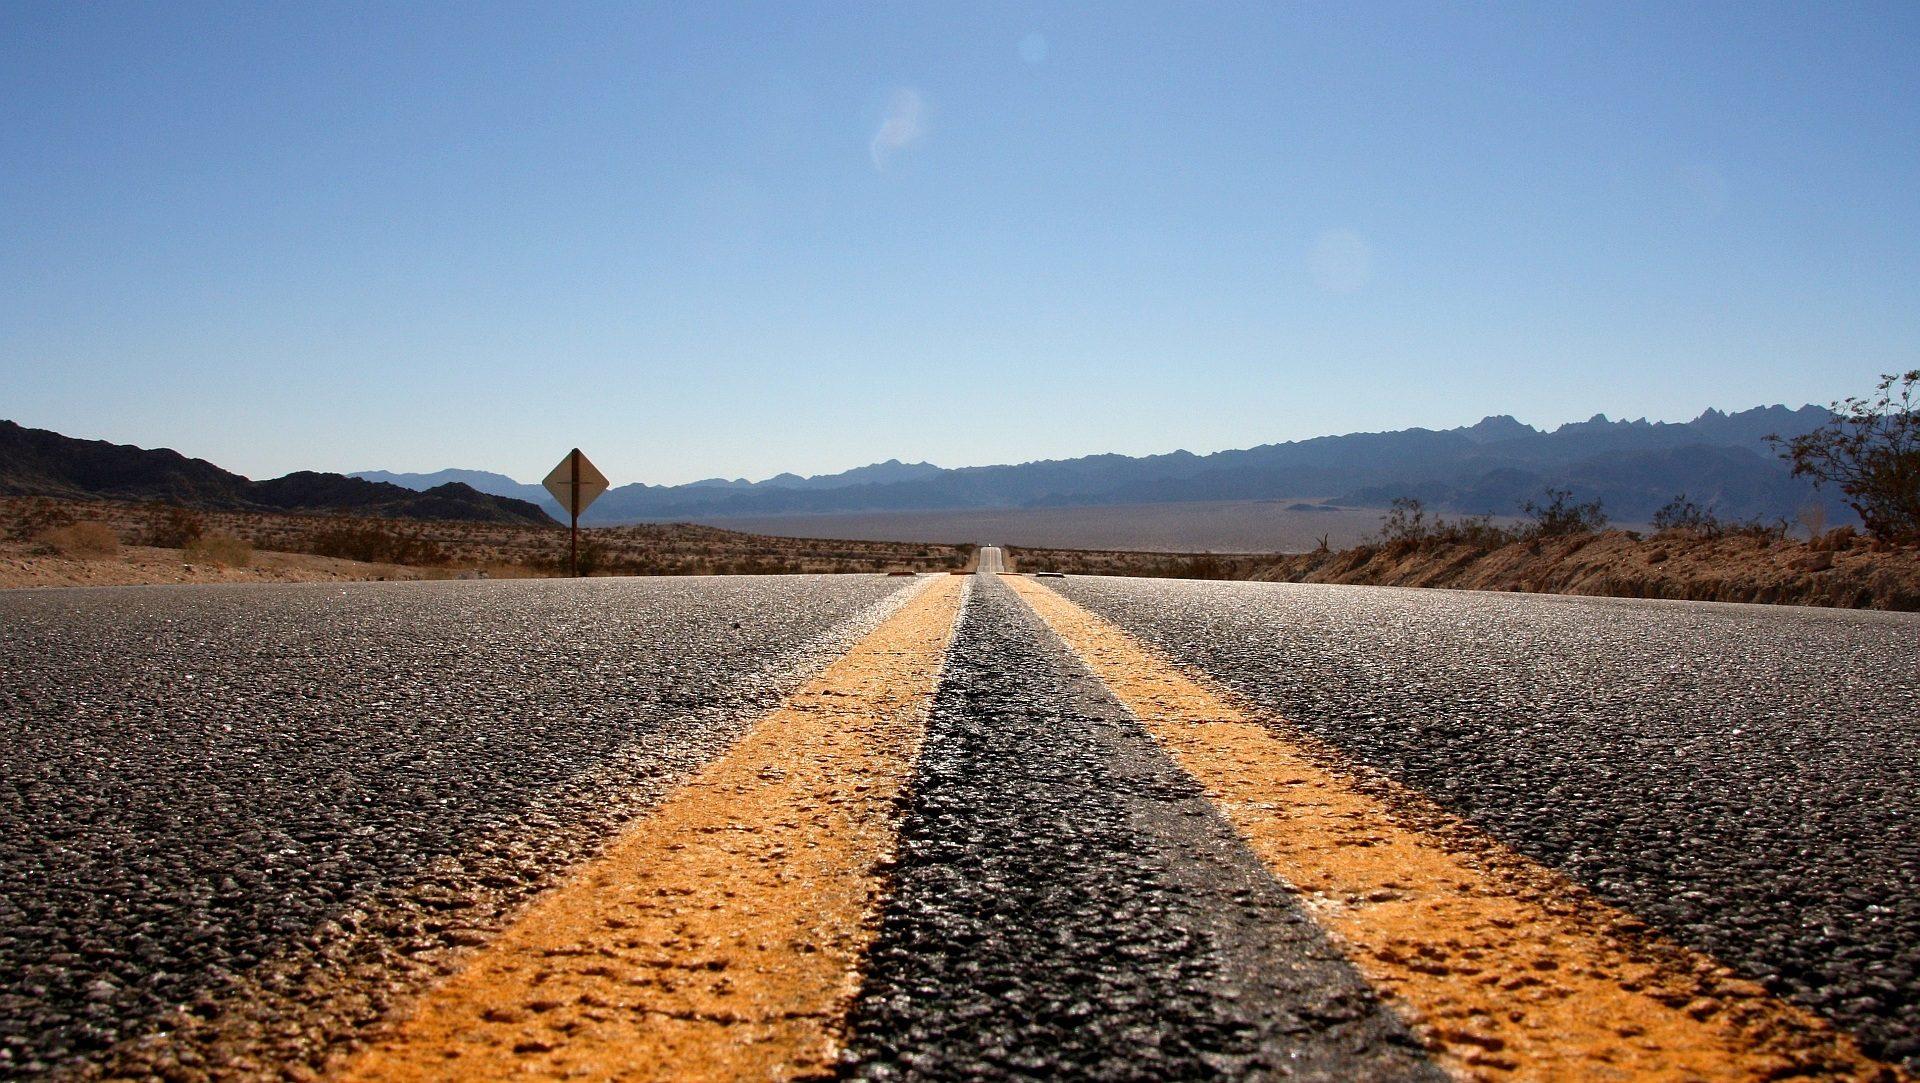 carretera, Straße, Asphalt, Montañas, Horizont, Abenteuer - Wallpaper HD - Prof.-falken.com